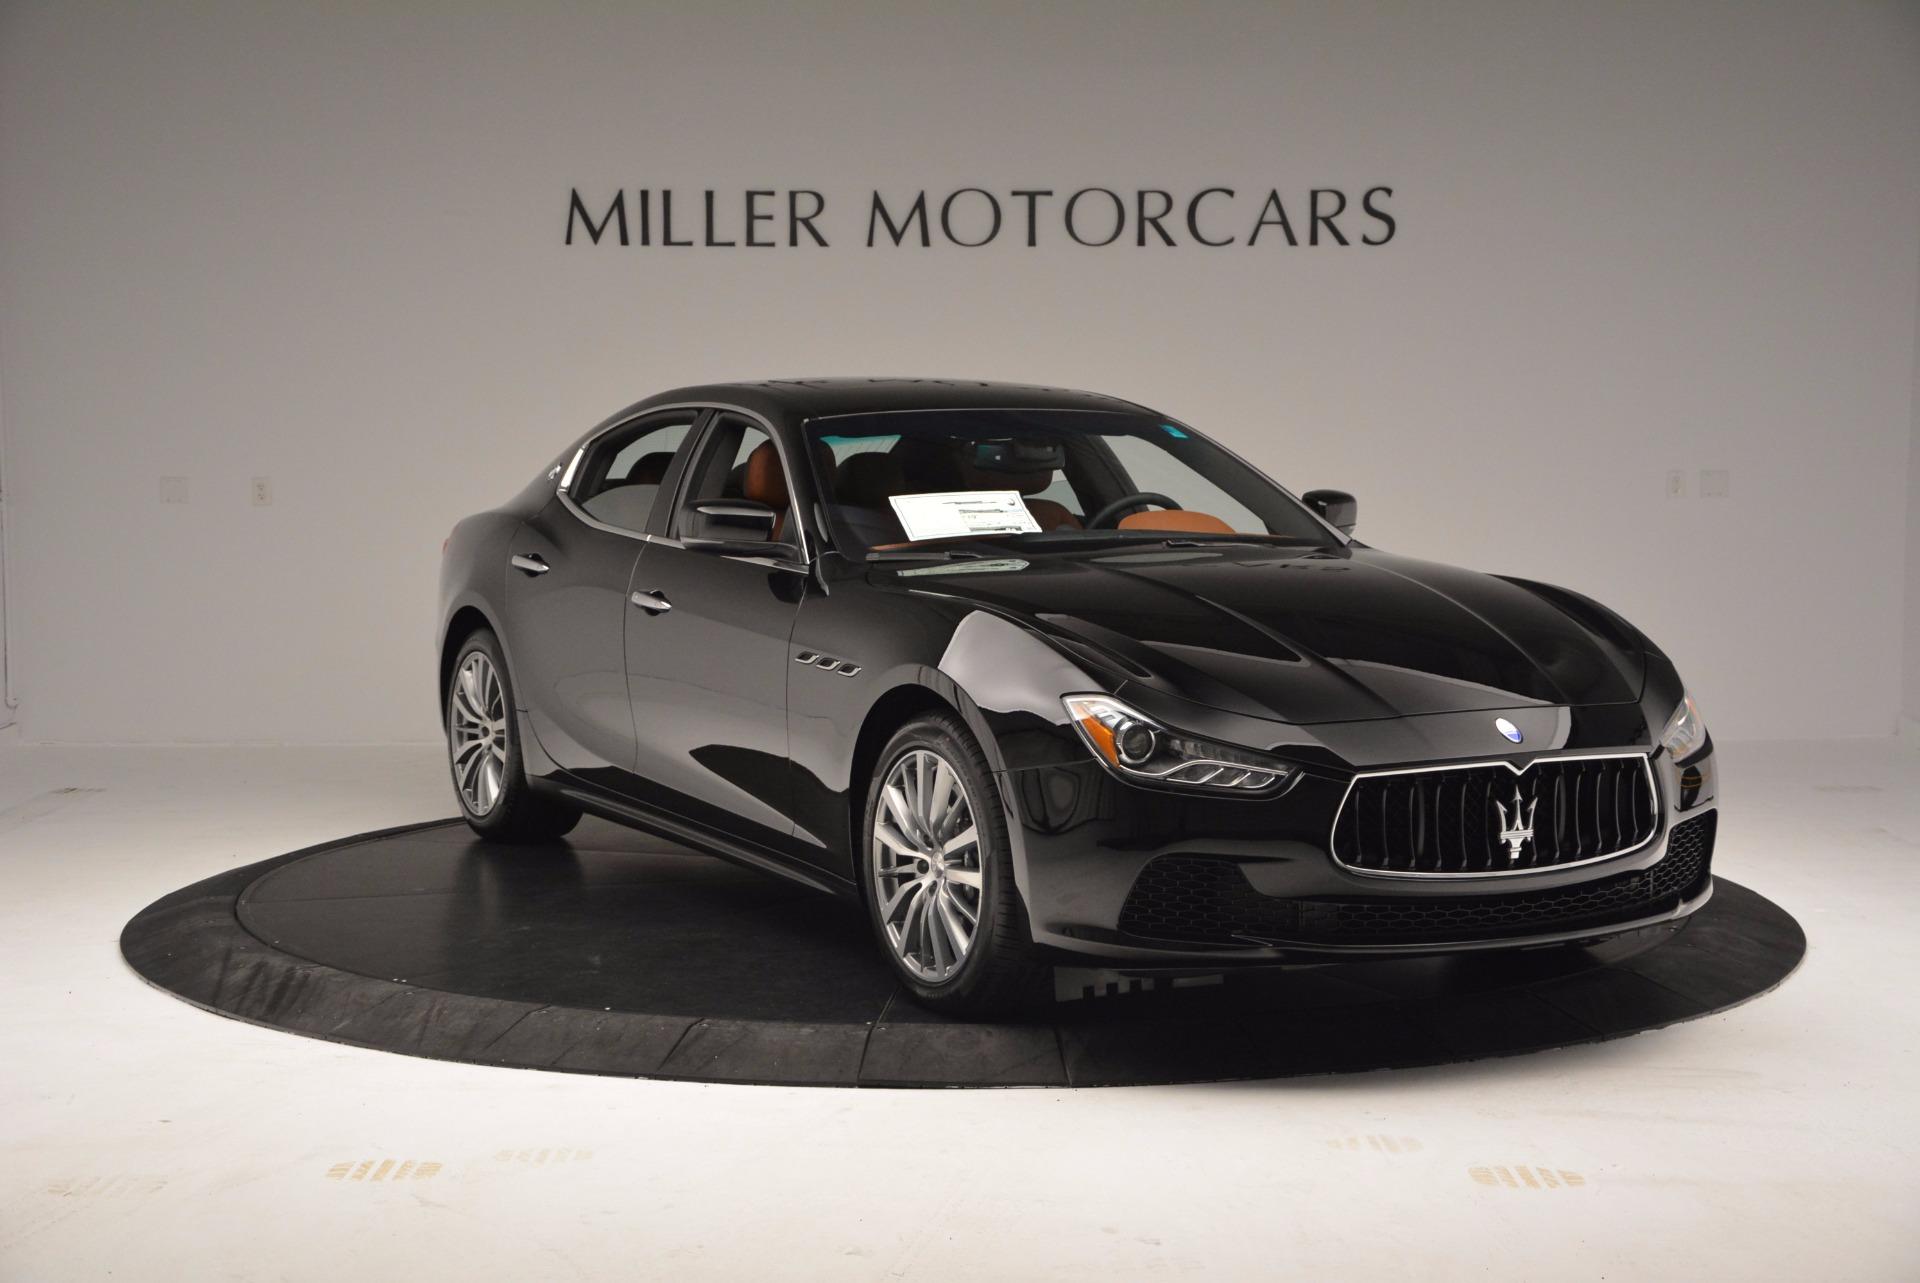 New 2017 Maserati Ghibli S Q4 EX-LOANER For Sale In Westport, CT 1115_p11